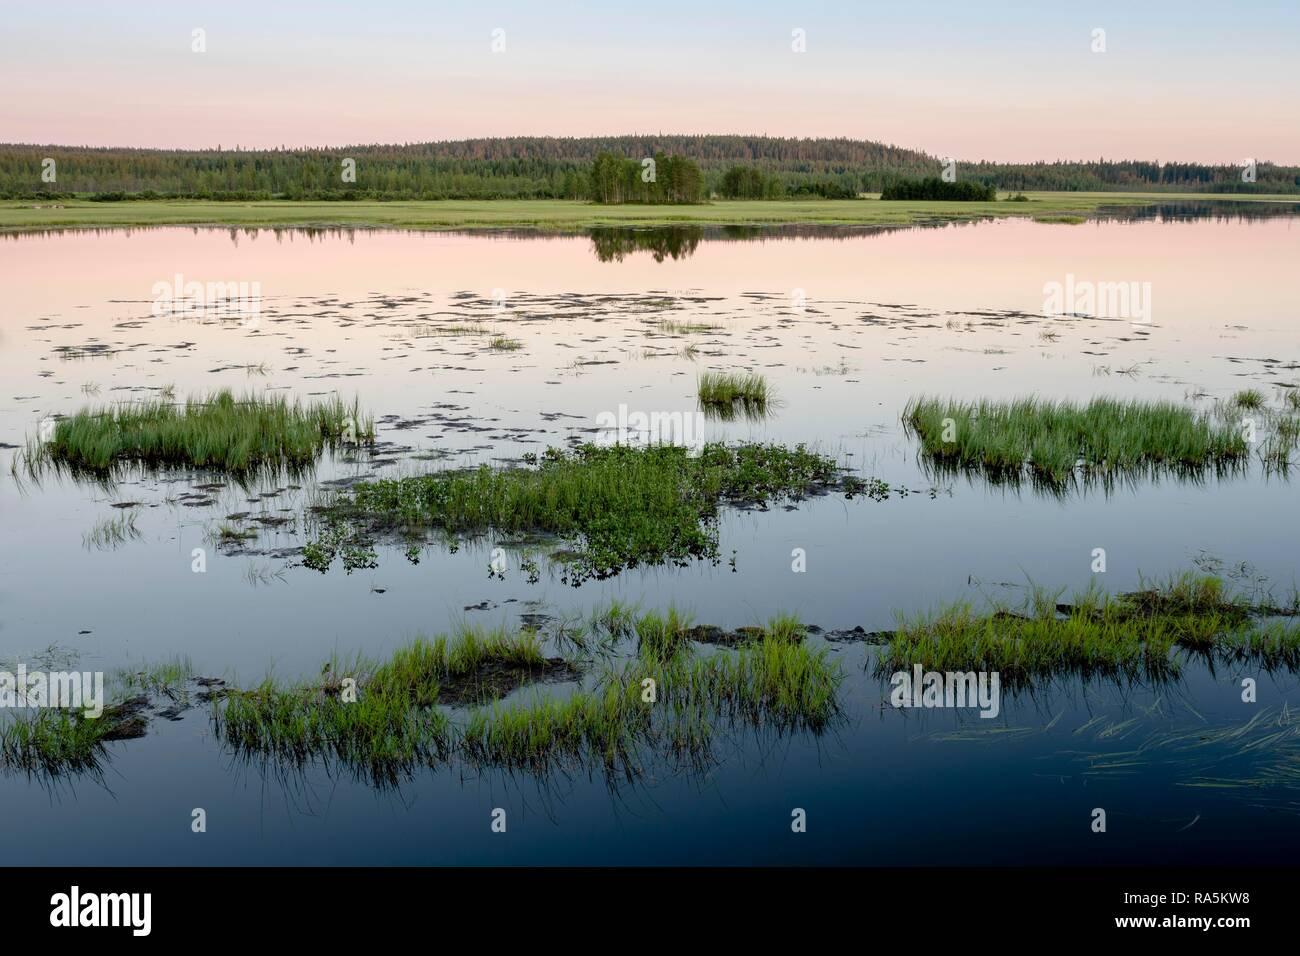 Sunset, grass tufts in the lake, lake landscape, wetlands, Kiantajaervi, Ruhtinansalmi, Lapland, Finland - Stock Image